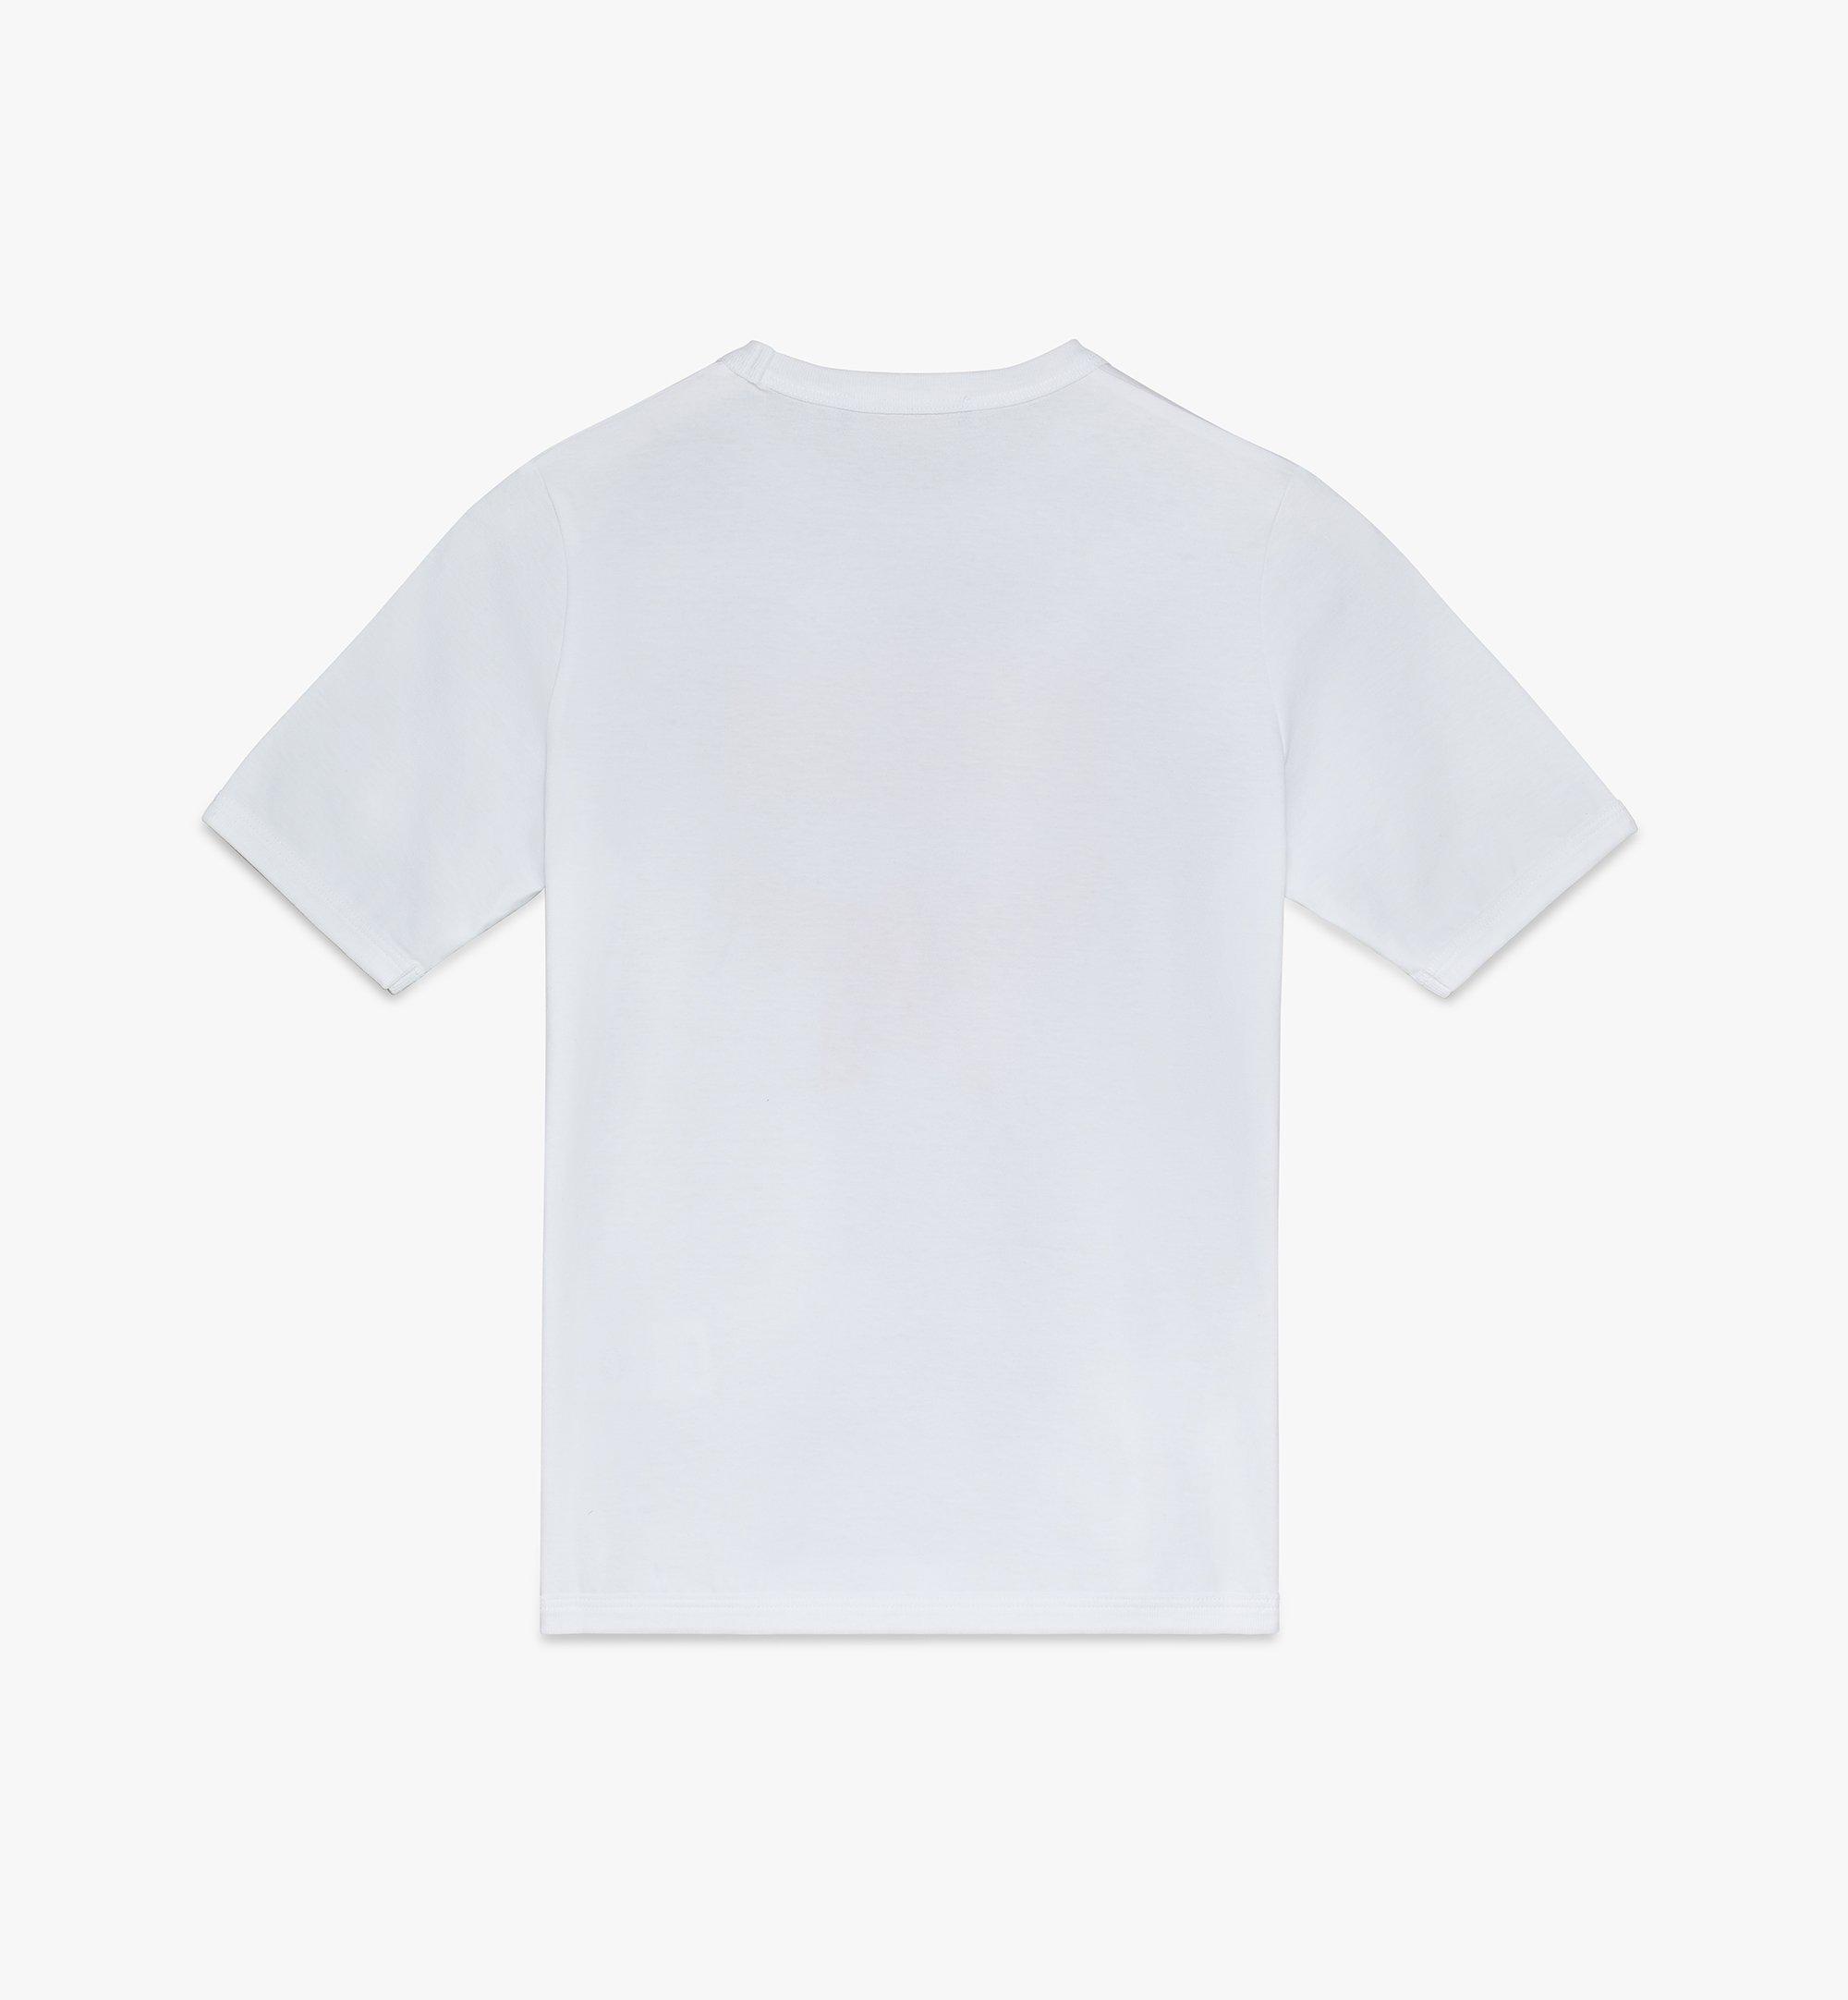 MCM ウィメンズ ロゴ Tシャツ White MFTASMM03WT00L Alternate View 2